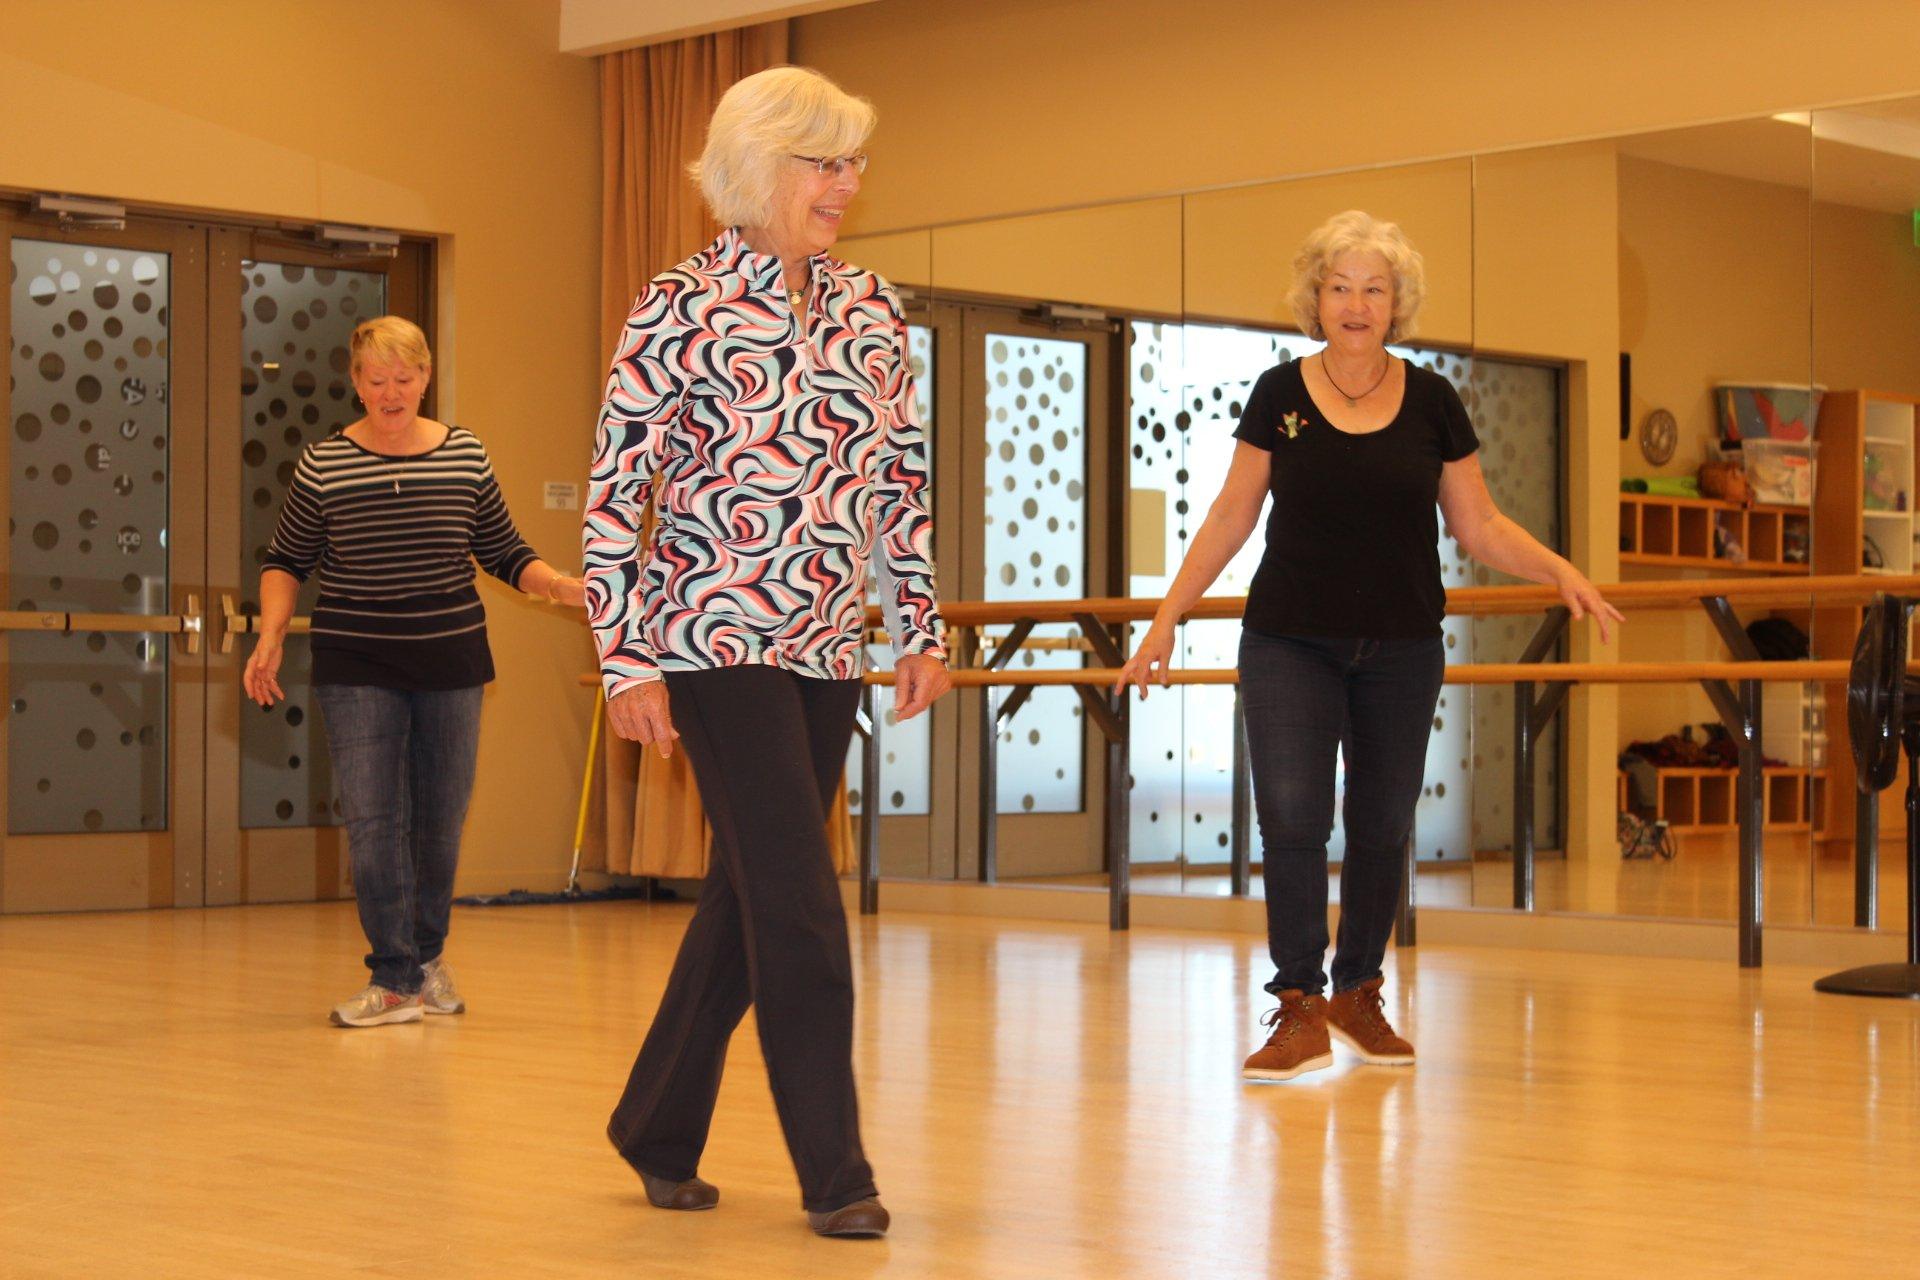 Intro to Line Dance